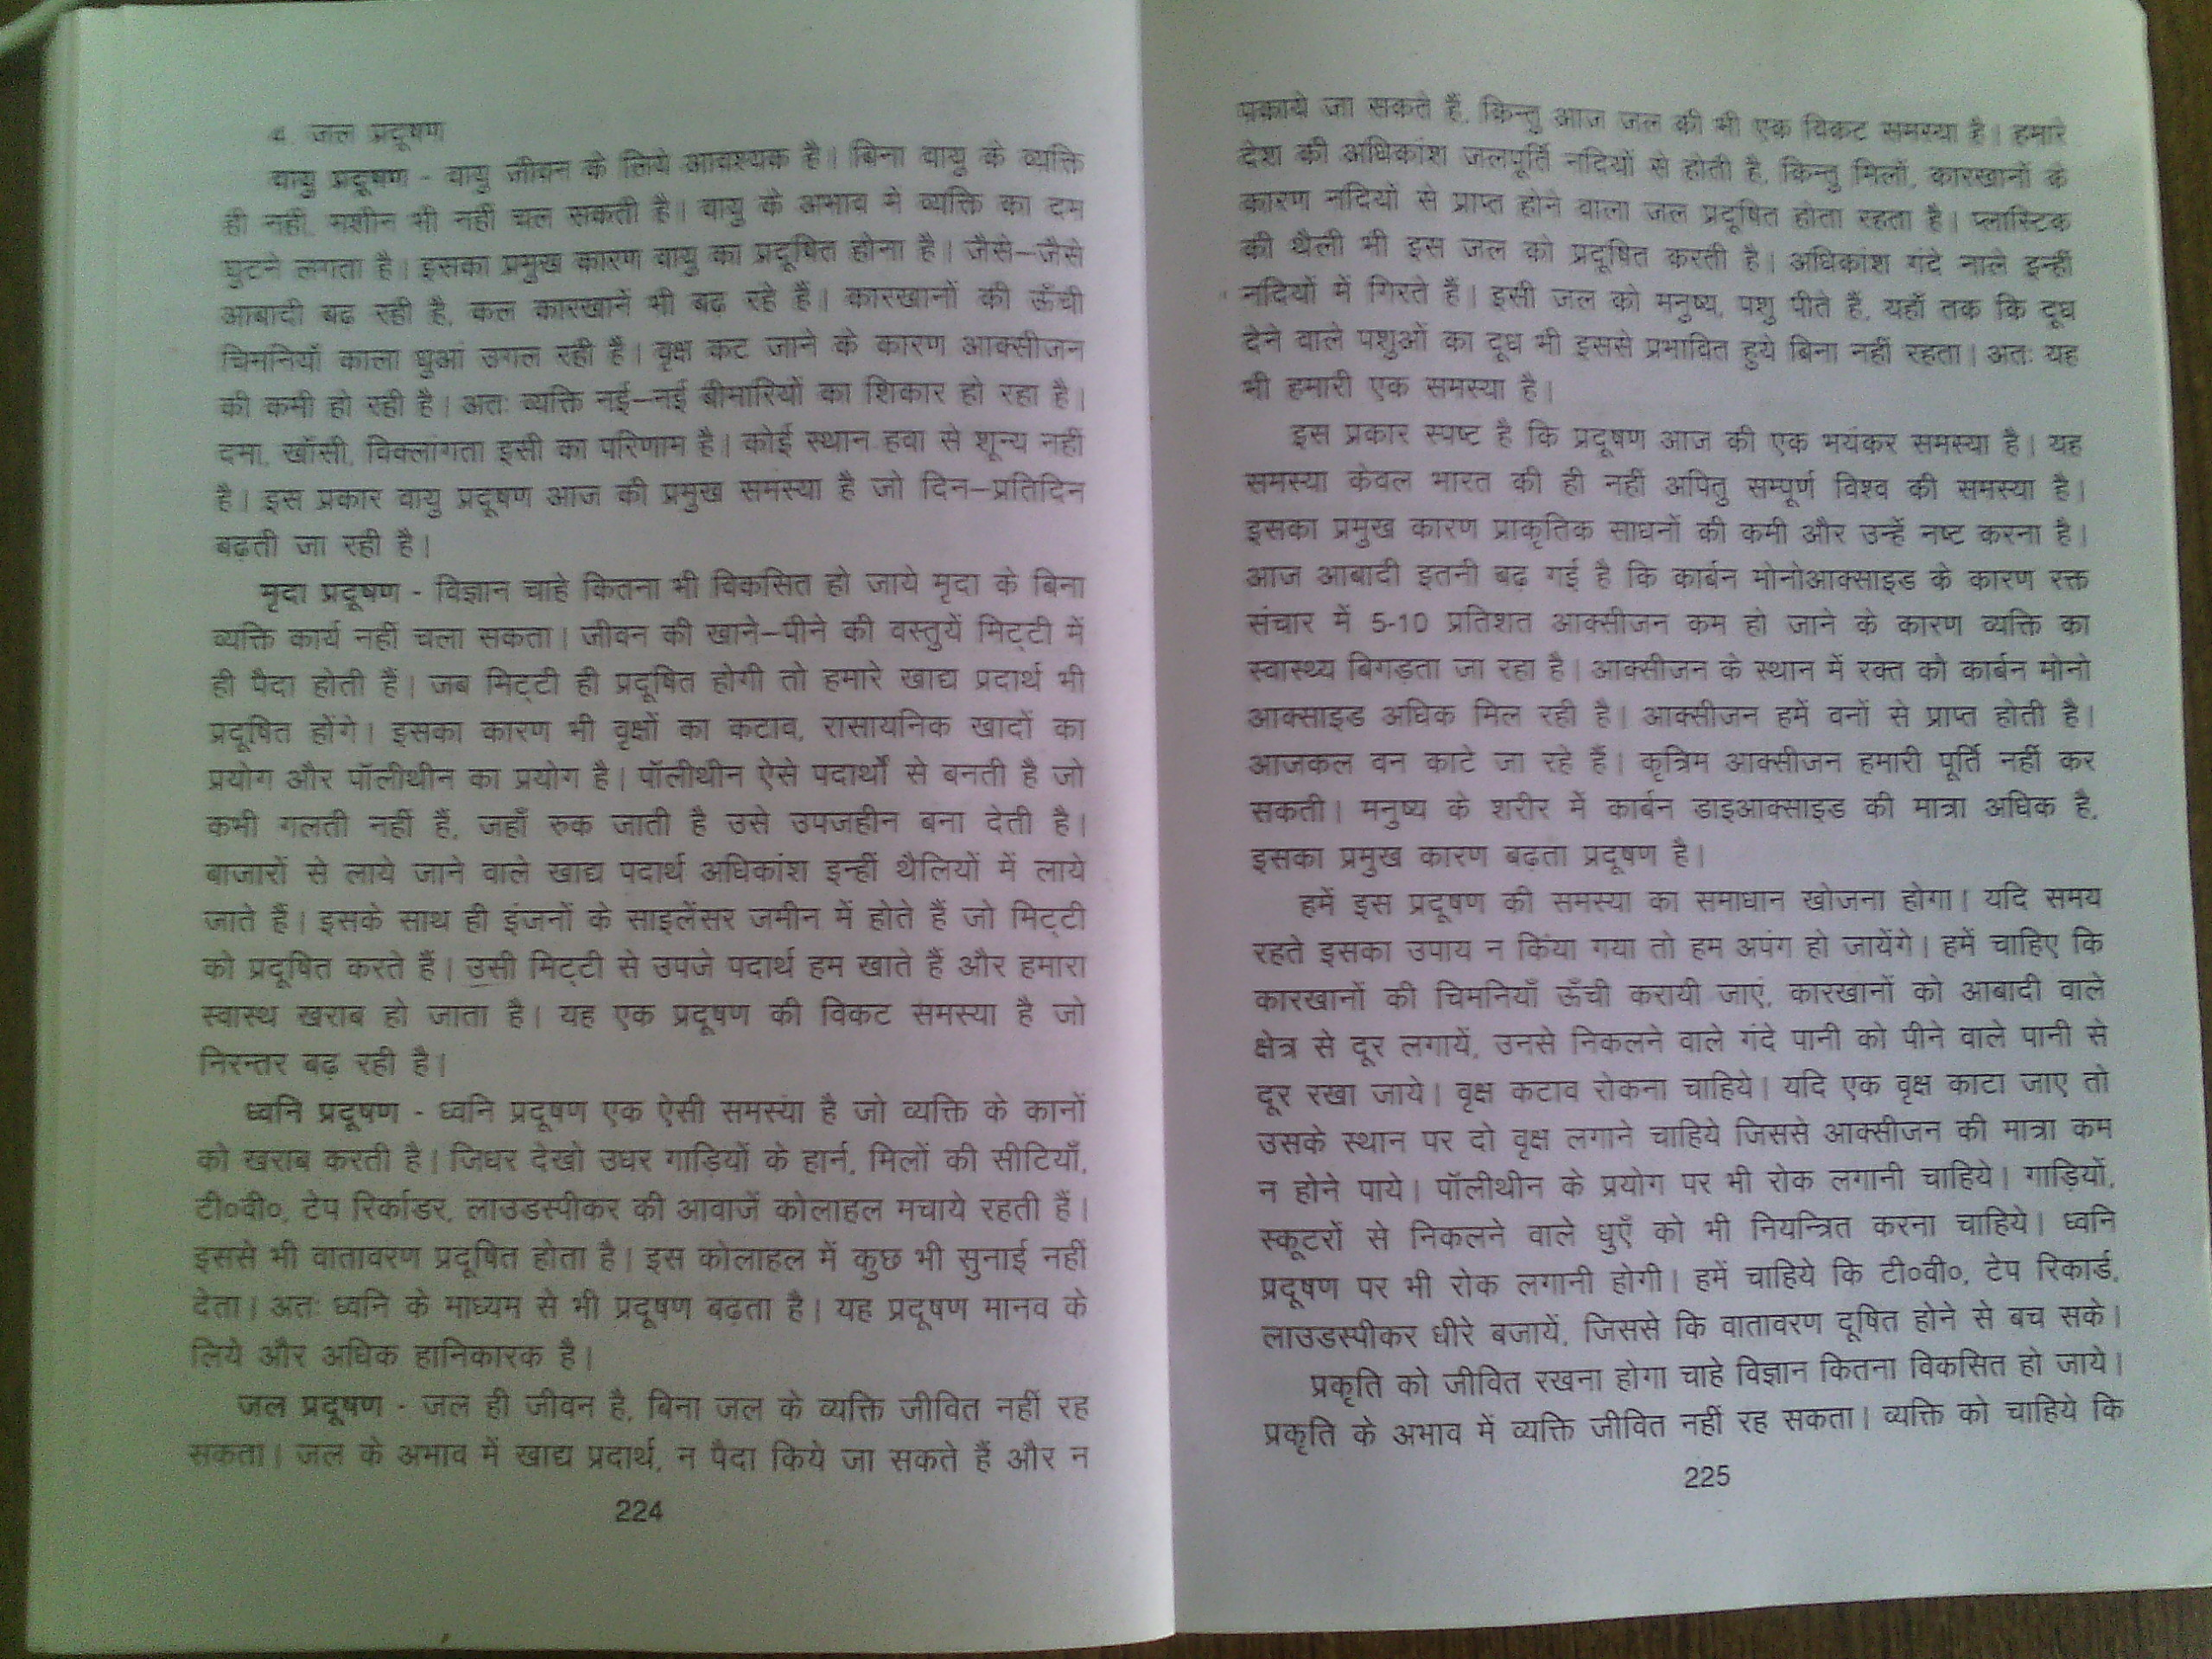 Essay on paryavaran pradushan in hindi new international division of labour thesis